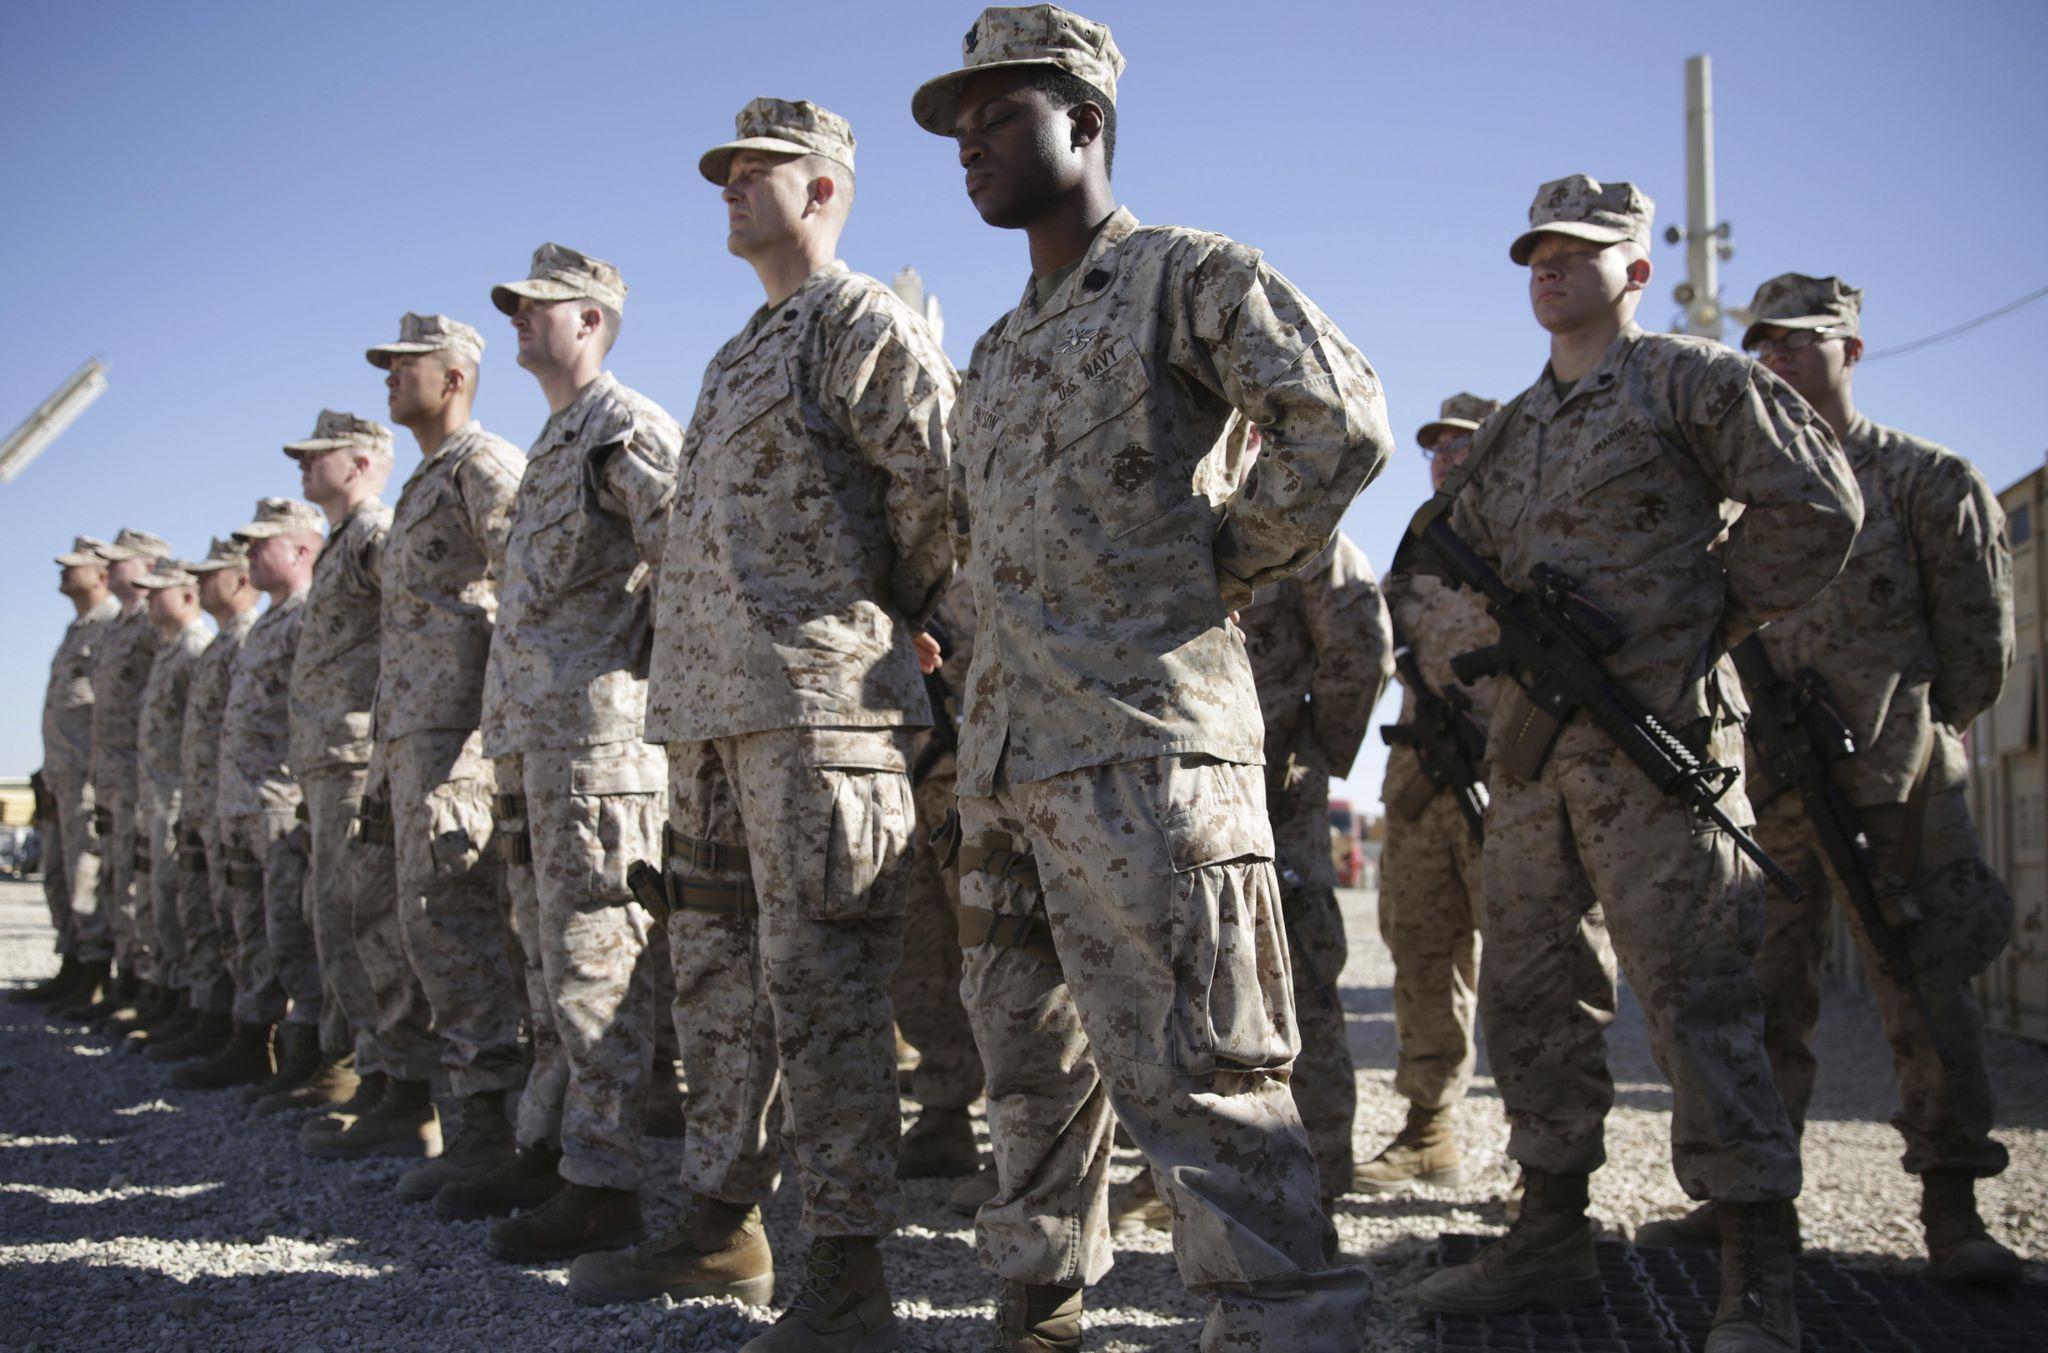 Pentagon identifies U.S. Army casualty in Afghanistan; first of 2019